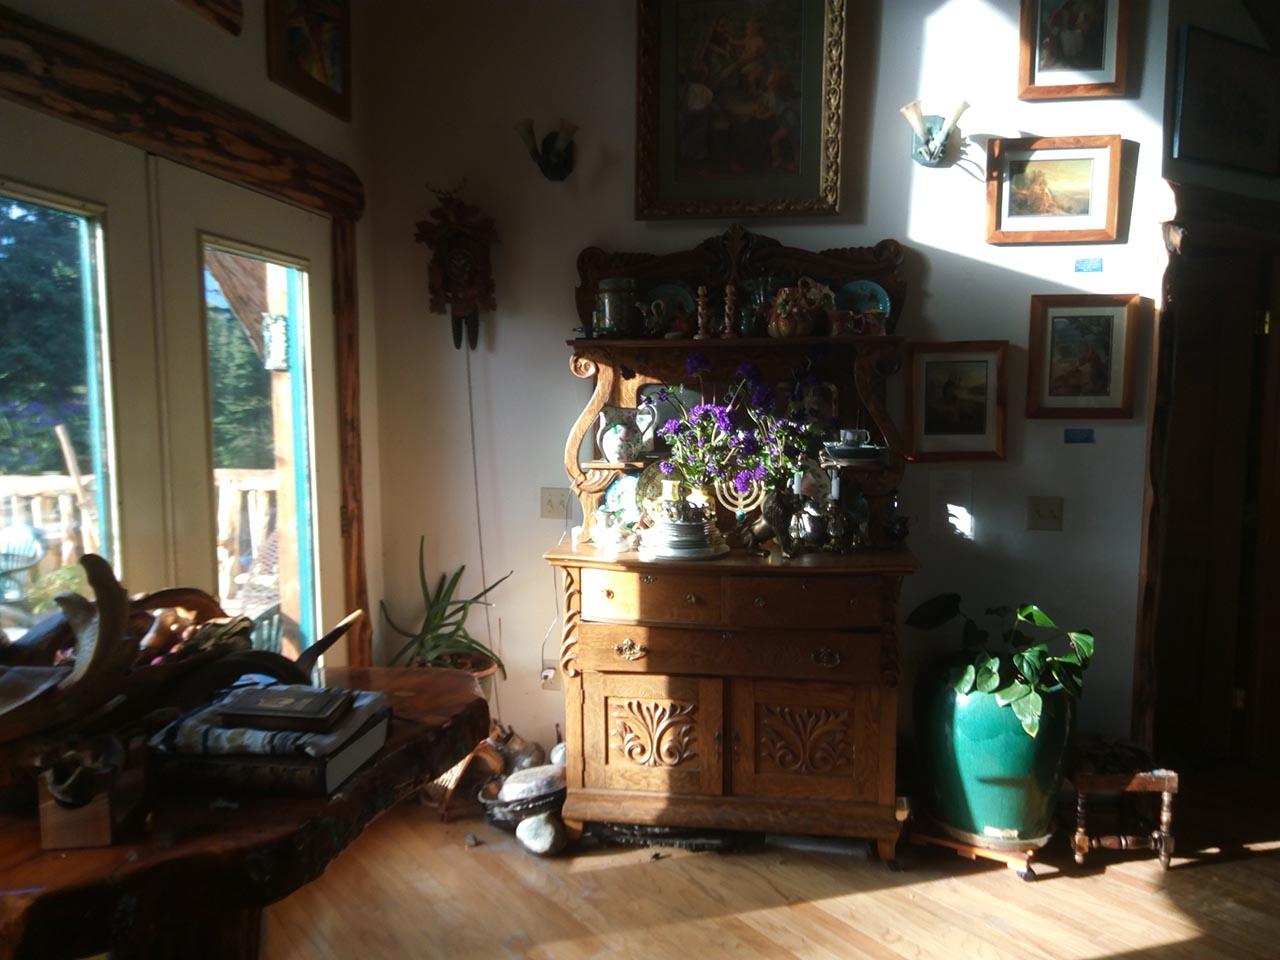 B&B interior - cabinet and framed photos.